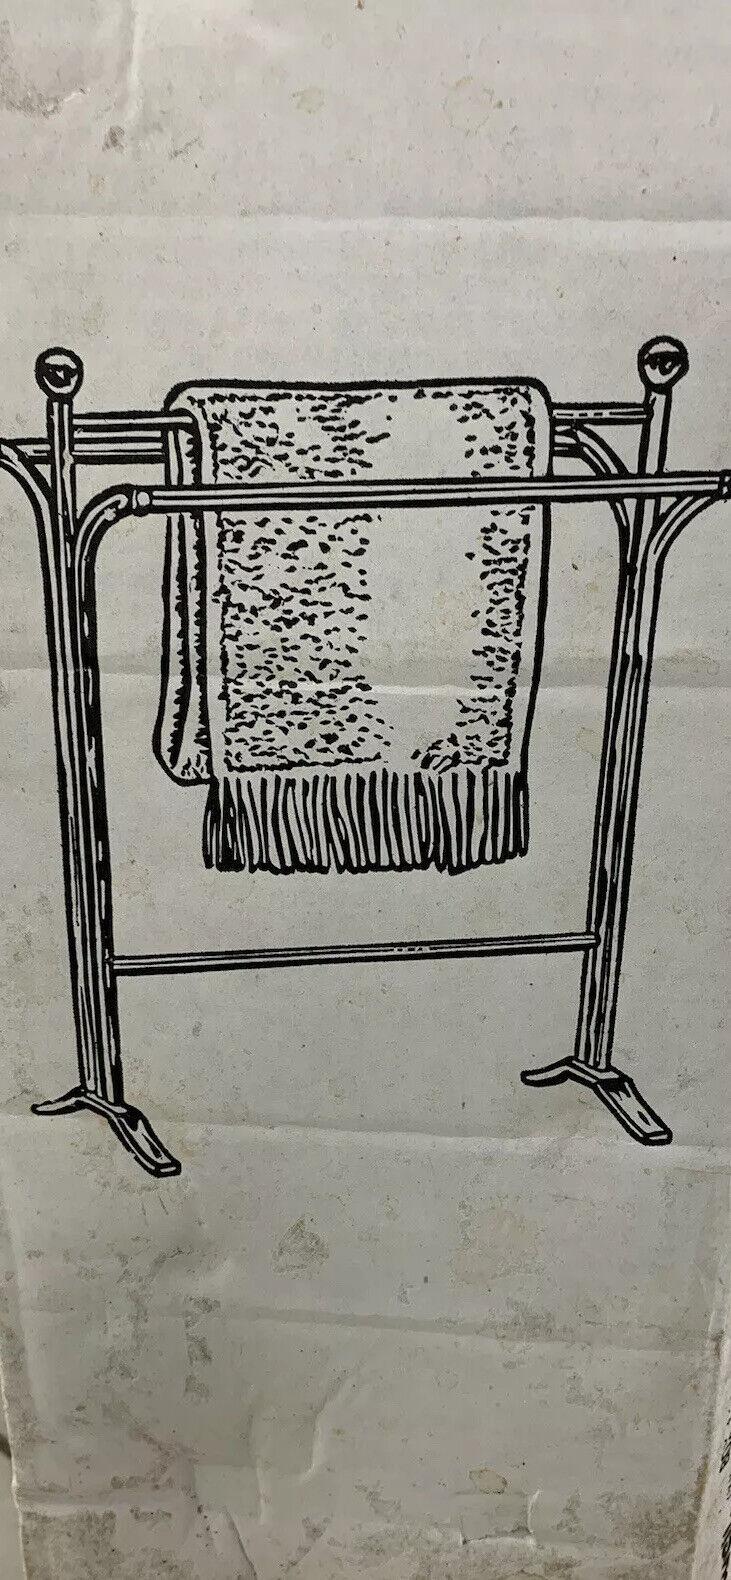 1 Brass Gold Quilt Blanket Rack Stand Floor Vintage NEW Never Used